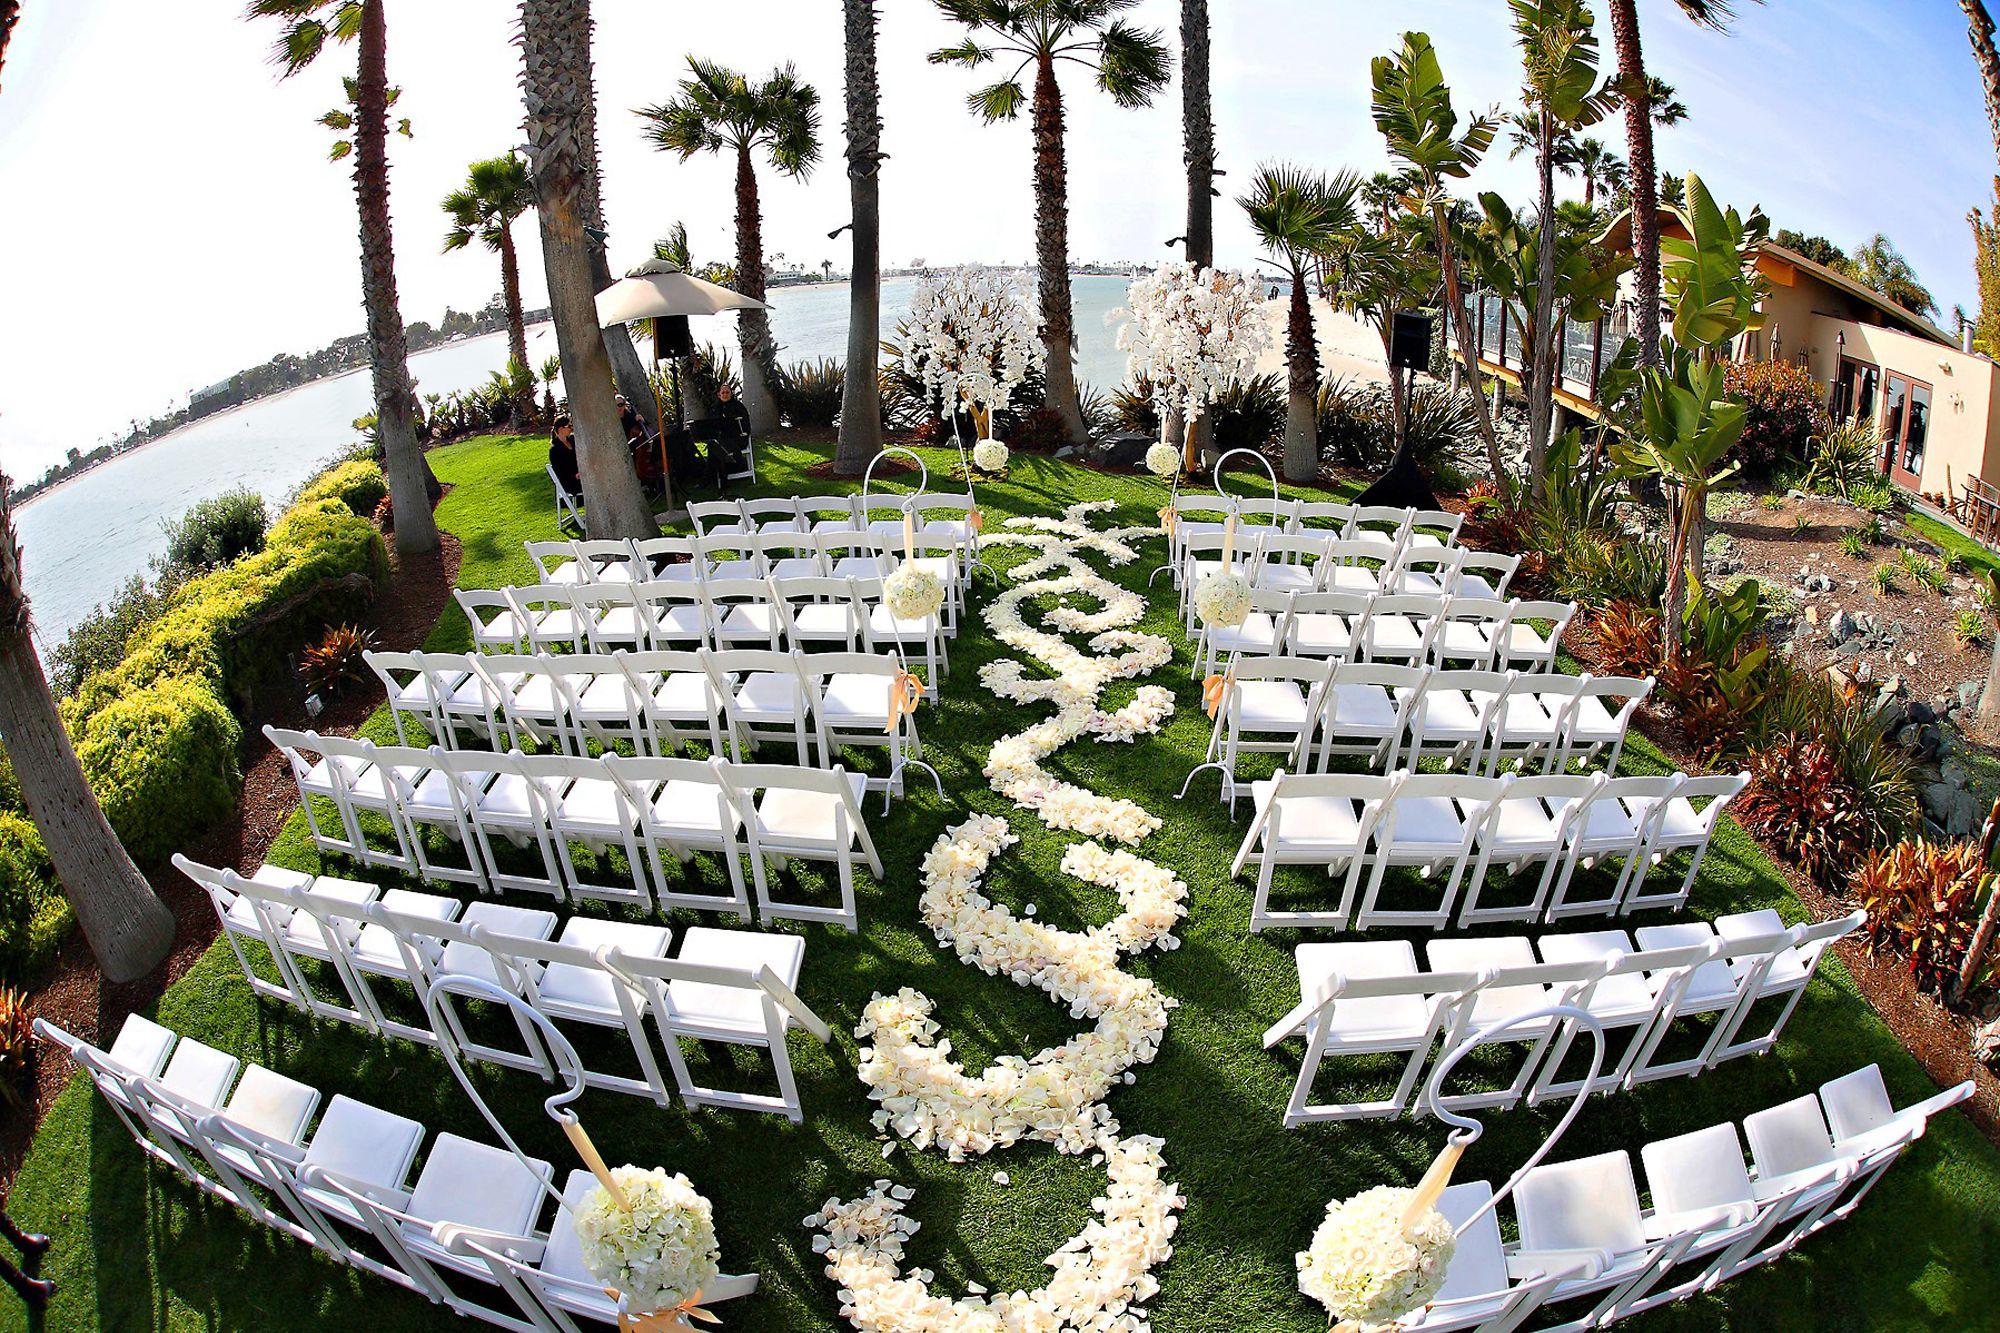 island point lawn beach wedding venue in san diego at paradise